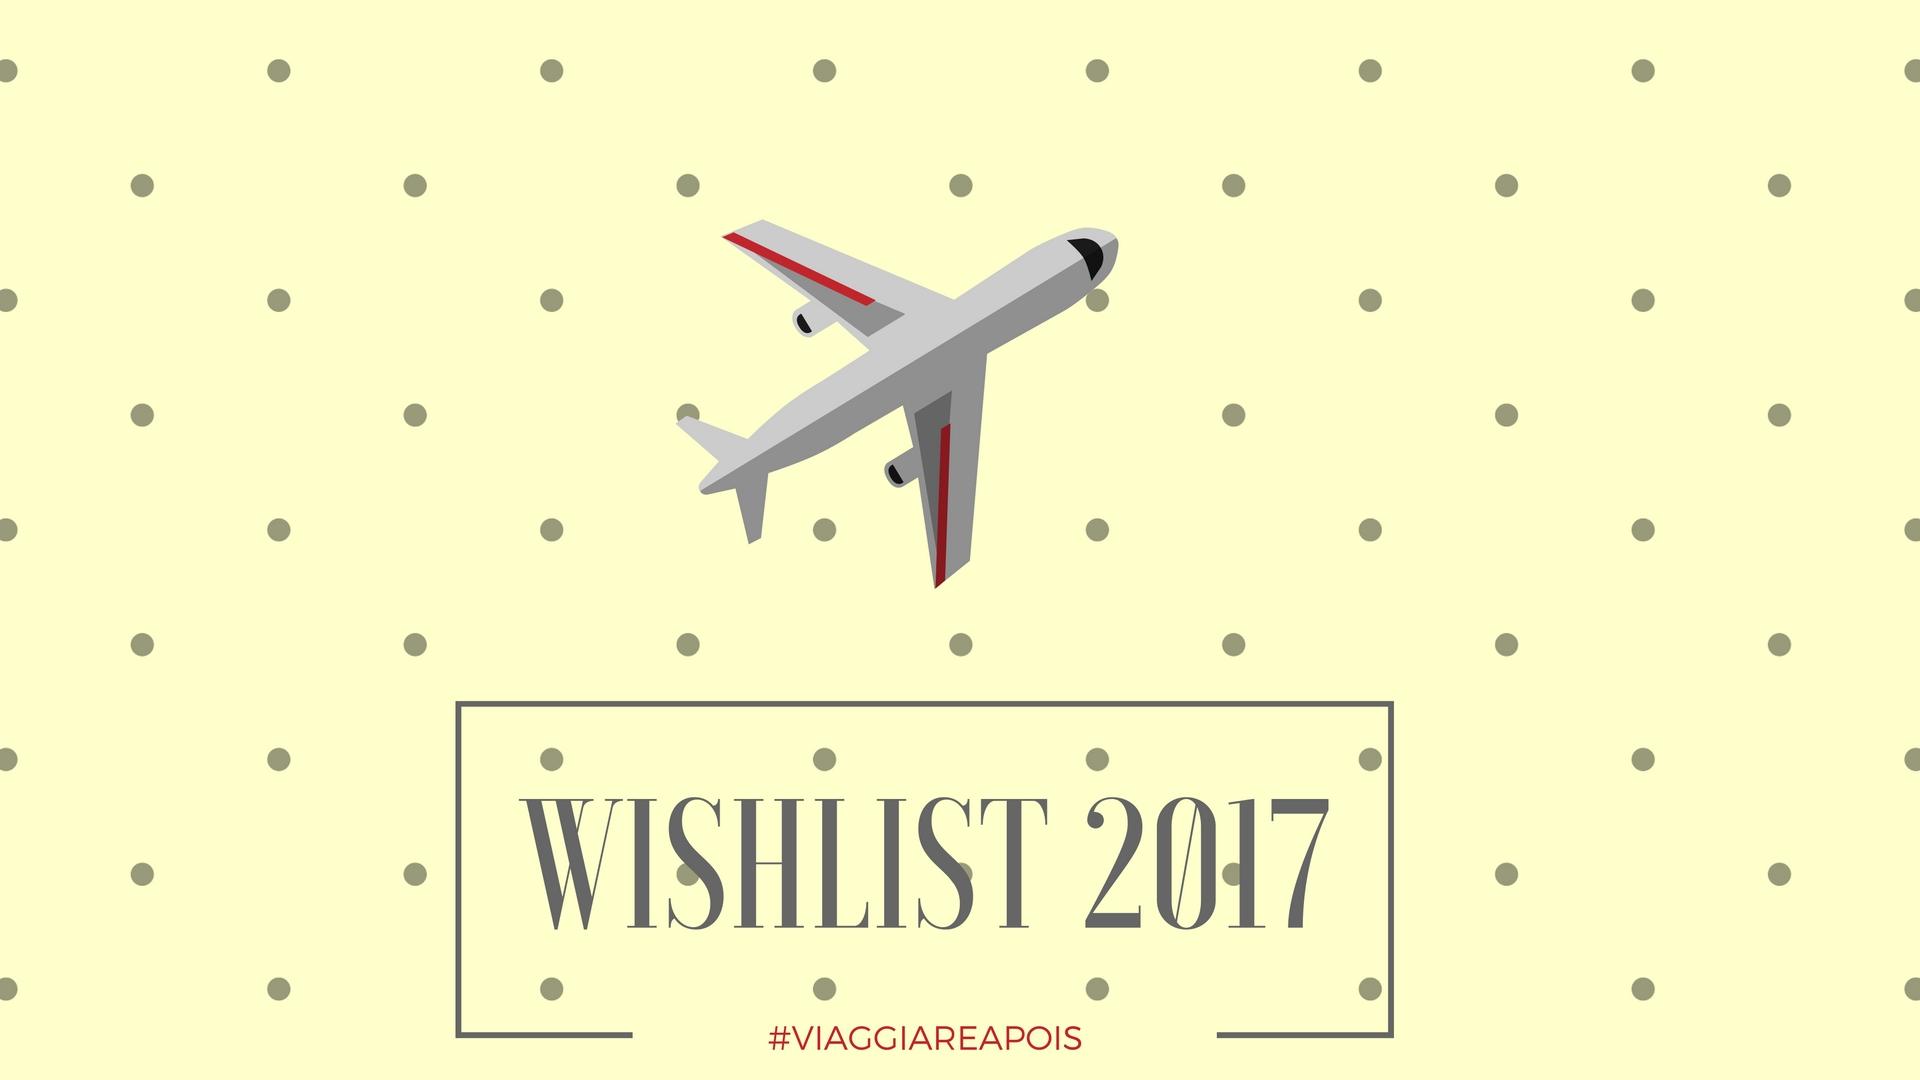 Wishlist 2017